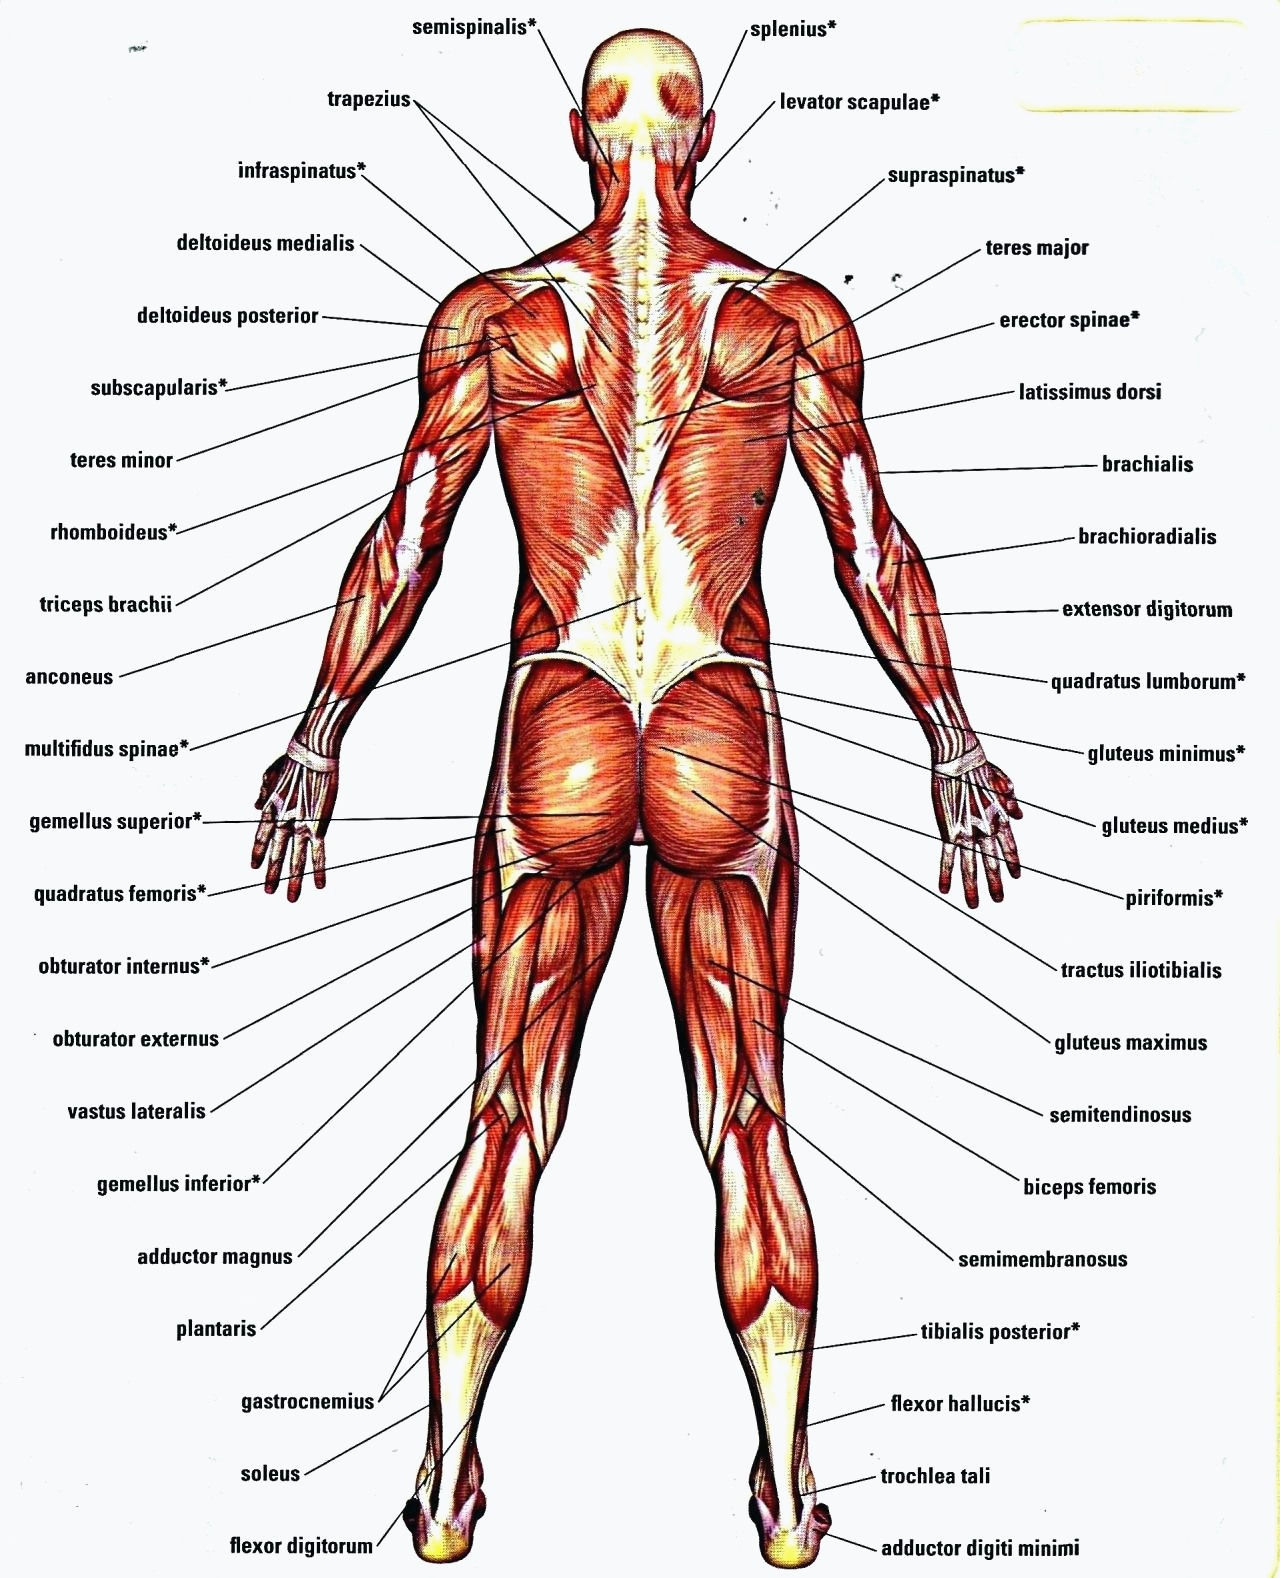 Diagram Of Human Body Organs Diagram Human Skull Worksheets For Anatomy For Anatomy Of Body